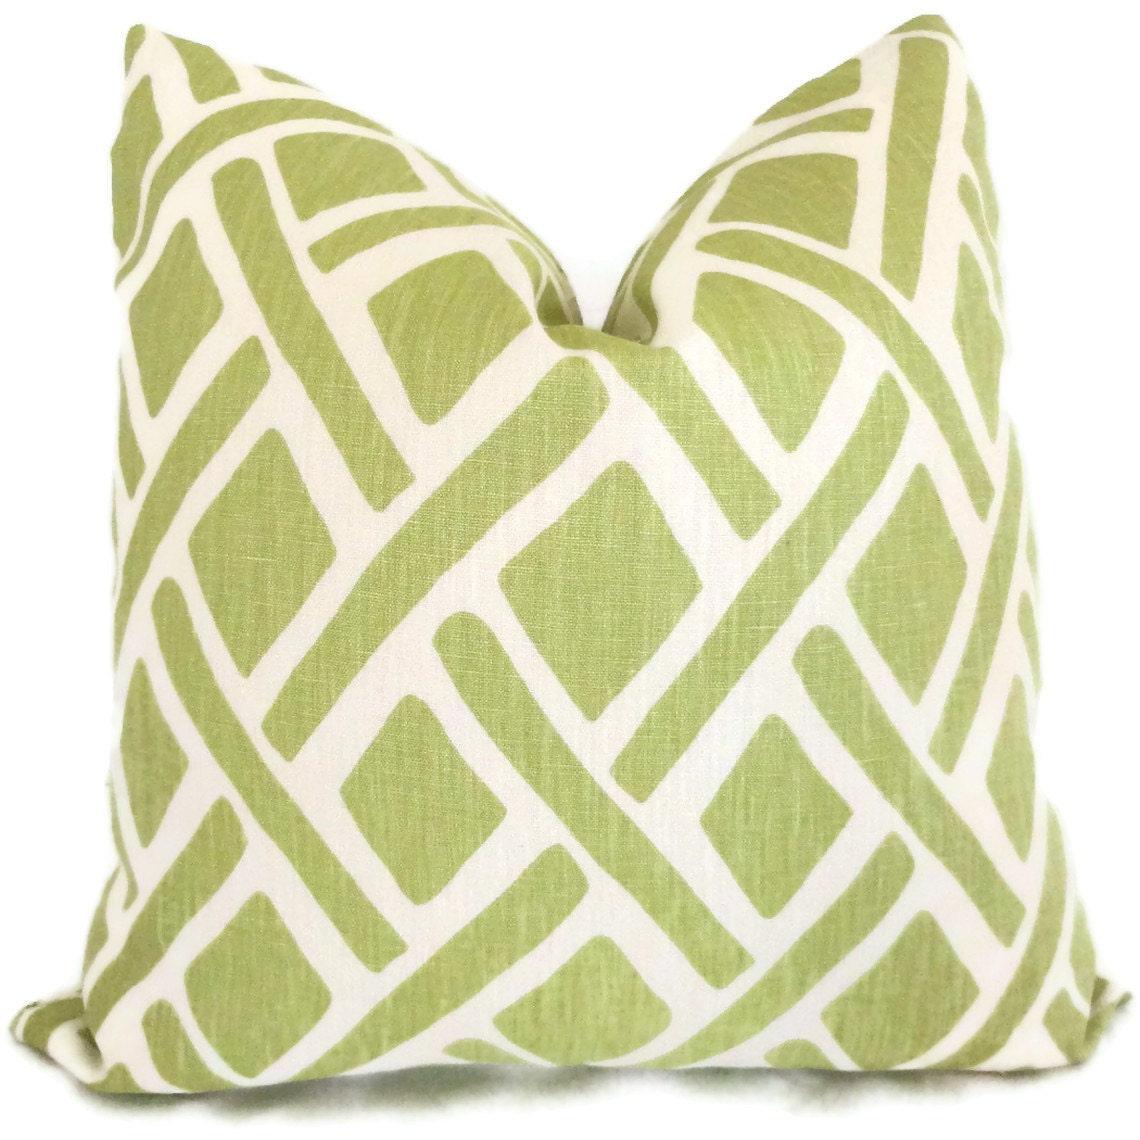 Kravet Green Trellis Decorative Pillow Cover 19x19 19x19